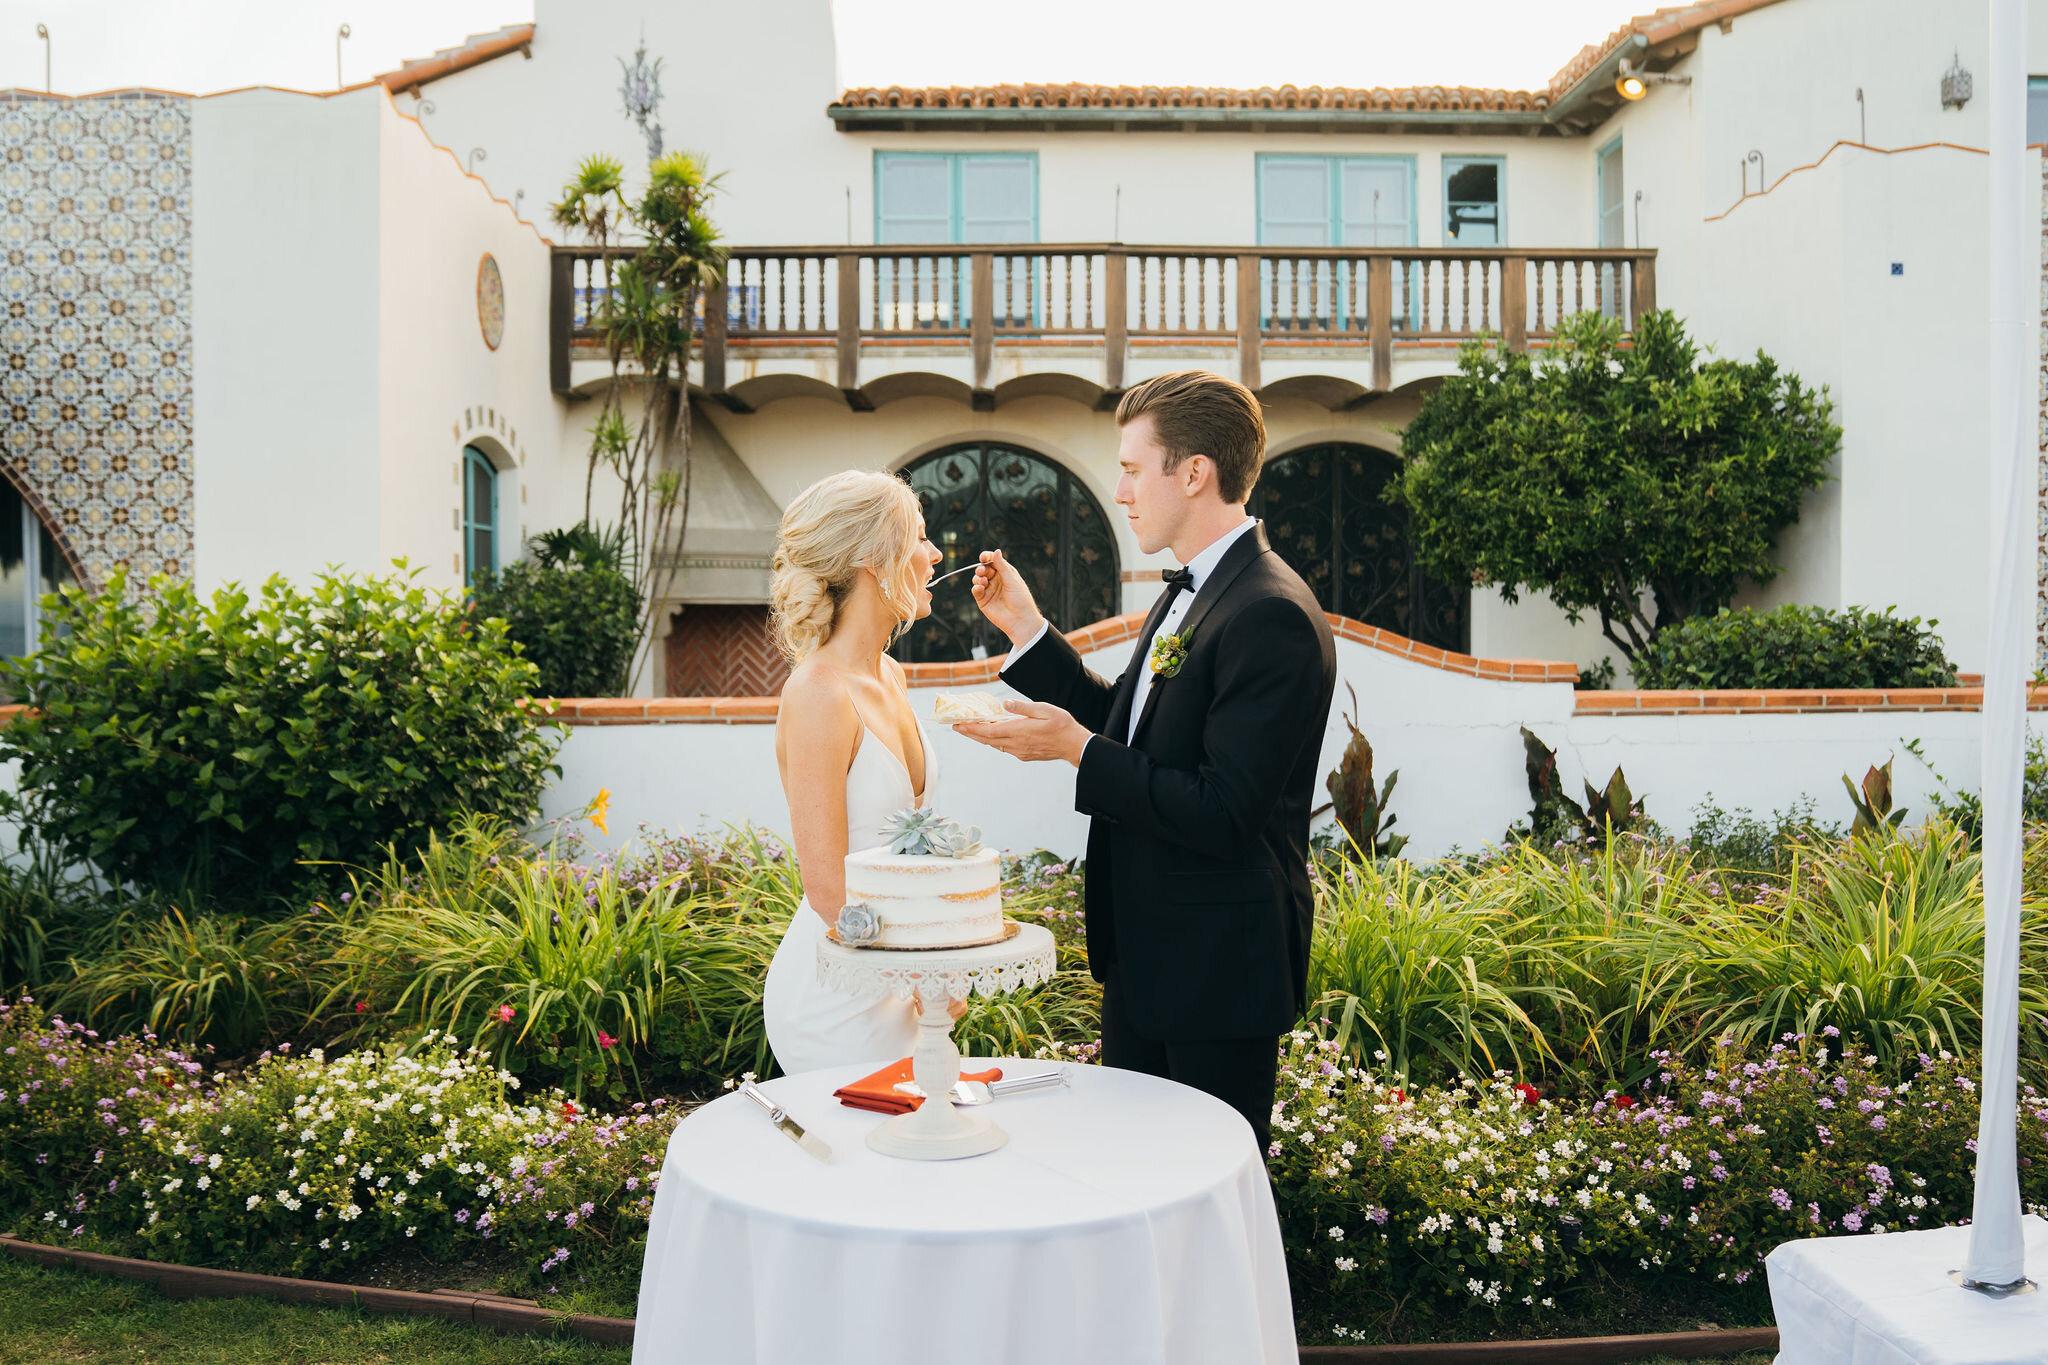 adamson-house-wedding-photography-167.jpg